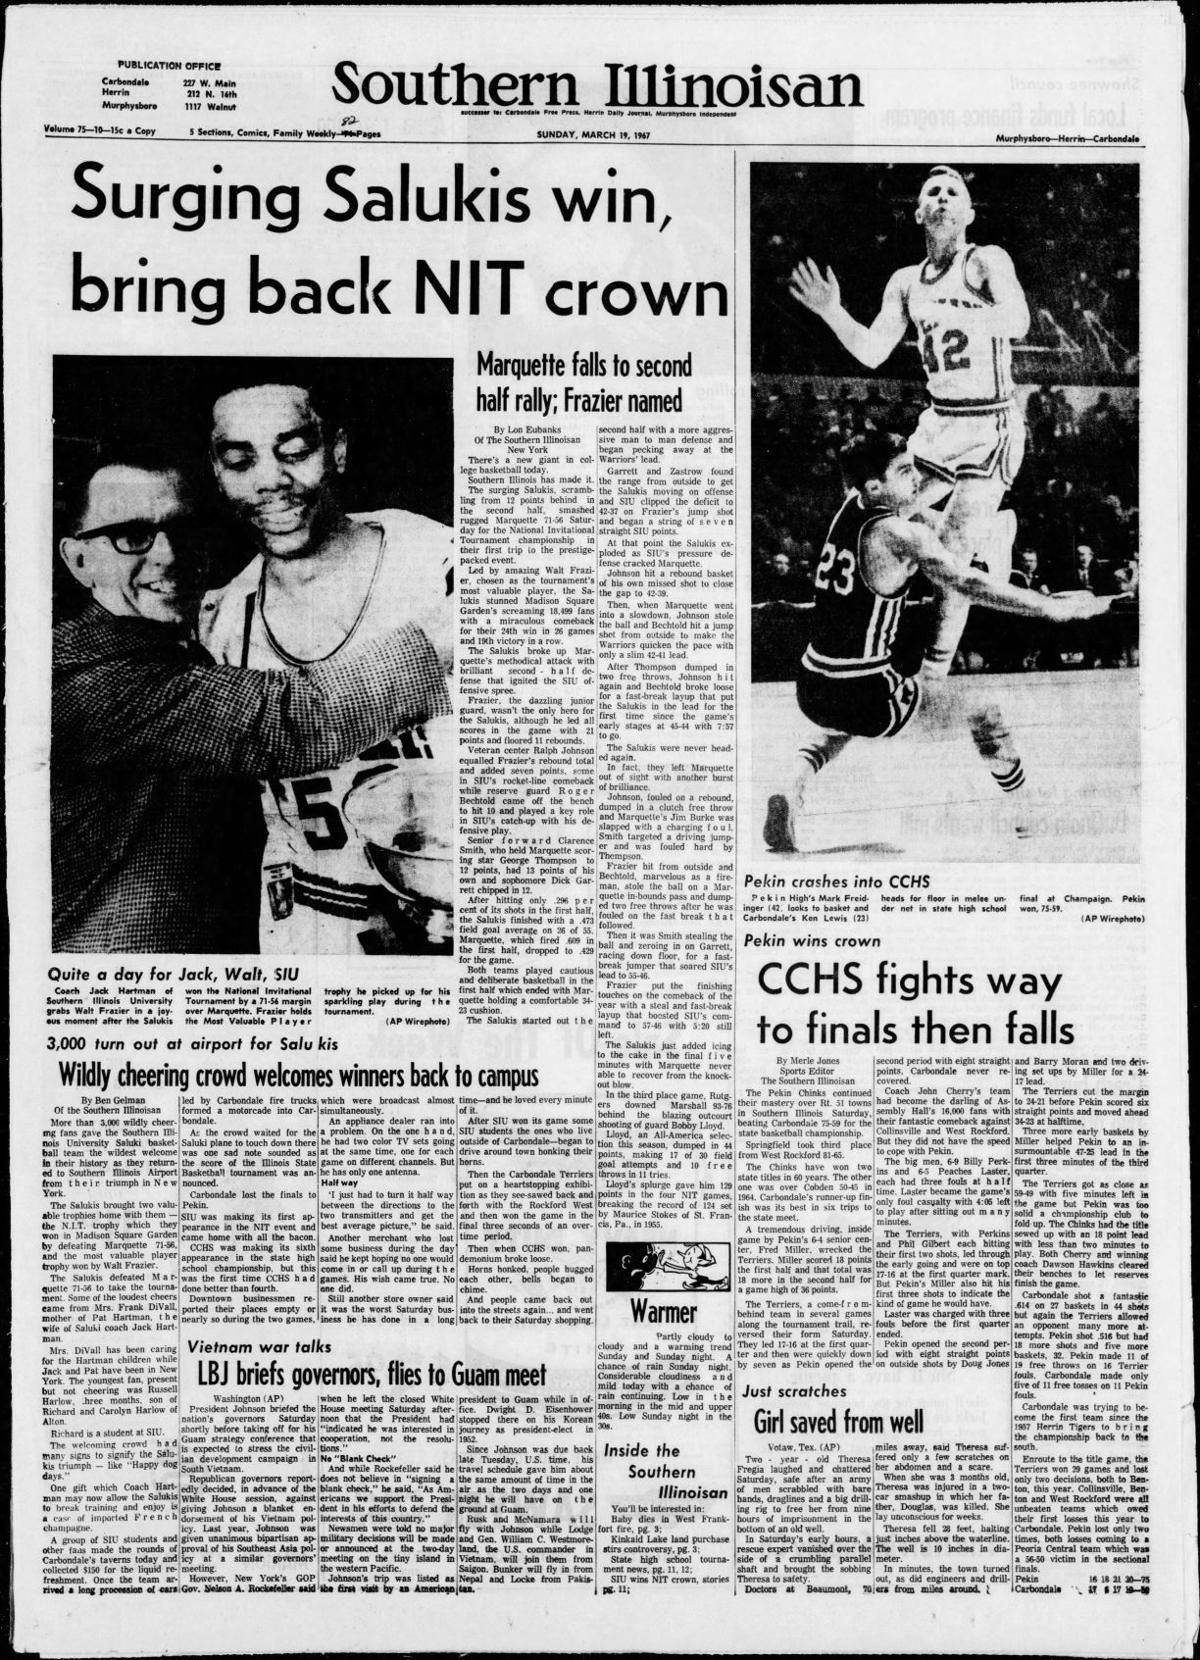 March 19, 1967 - SIU Basketball NIT